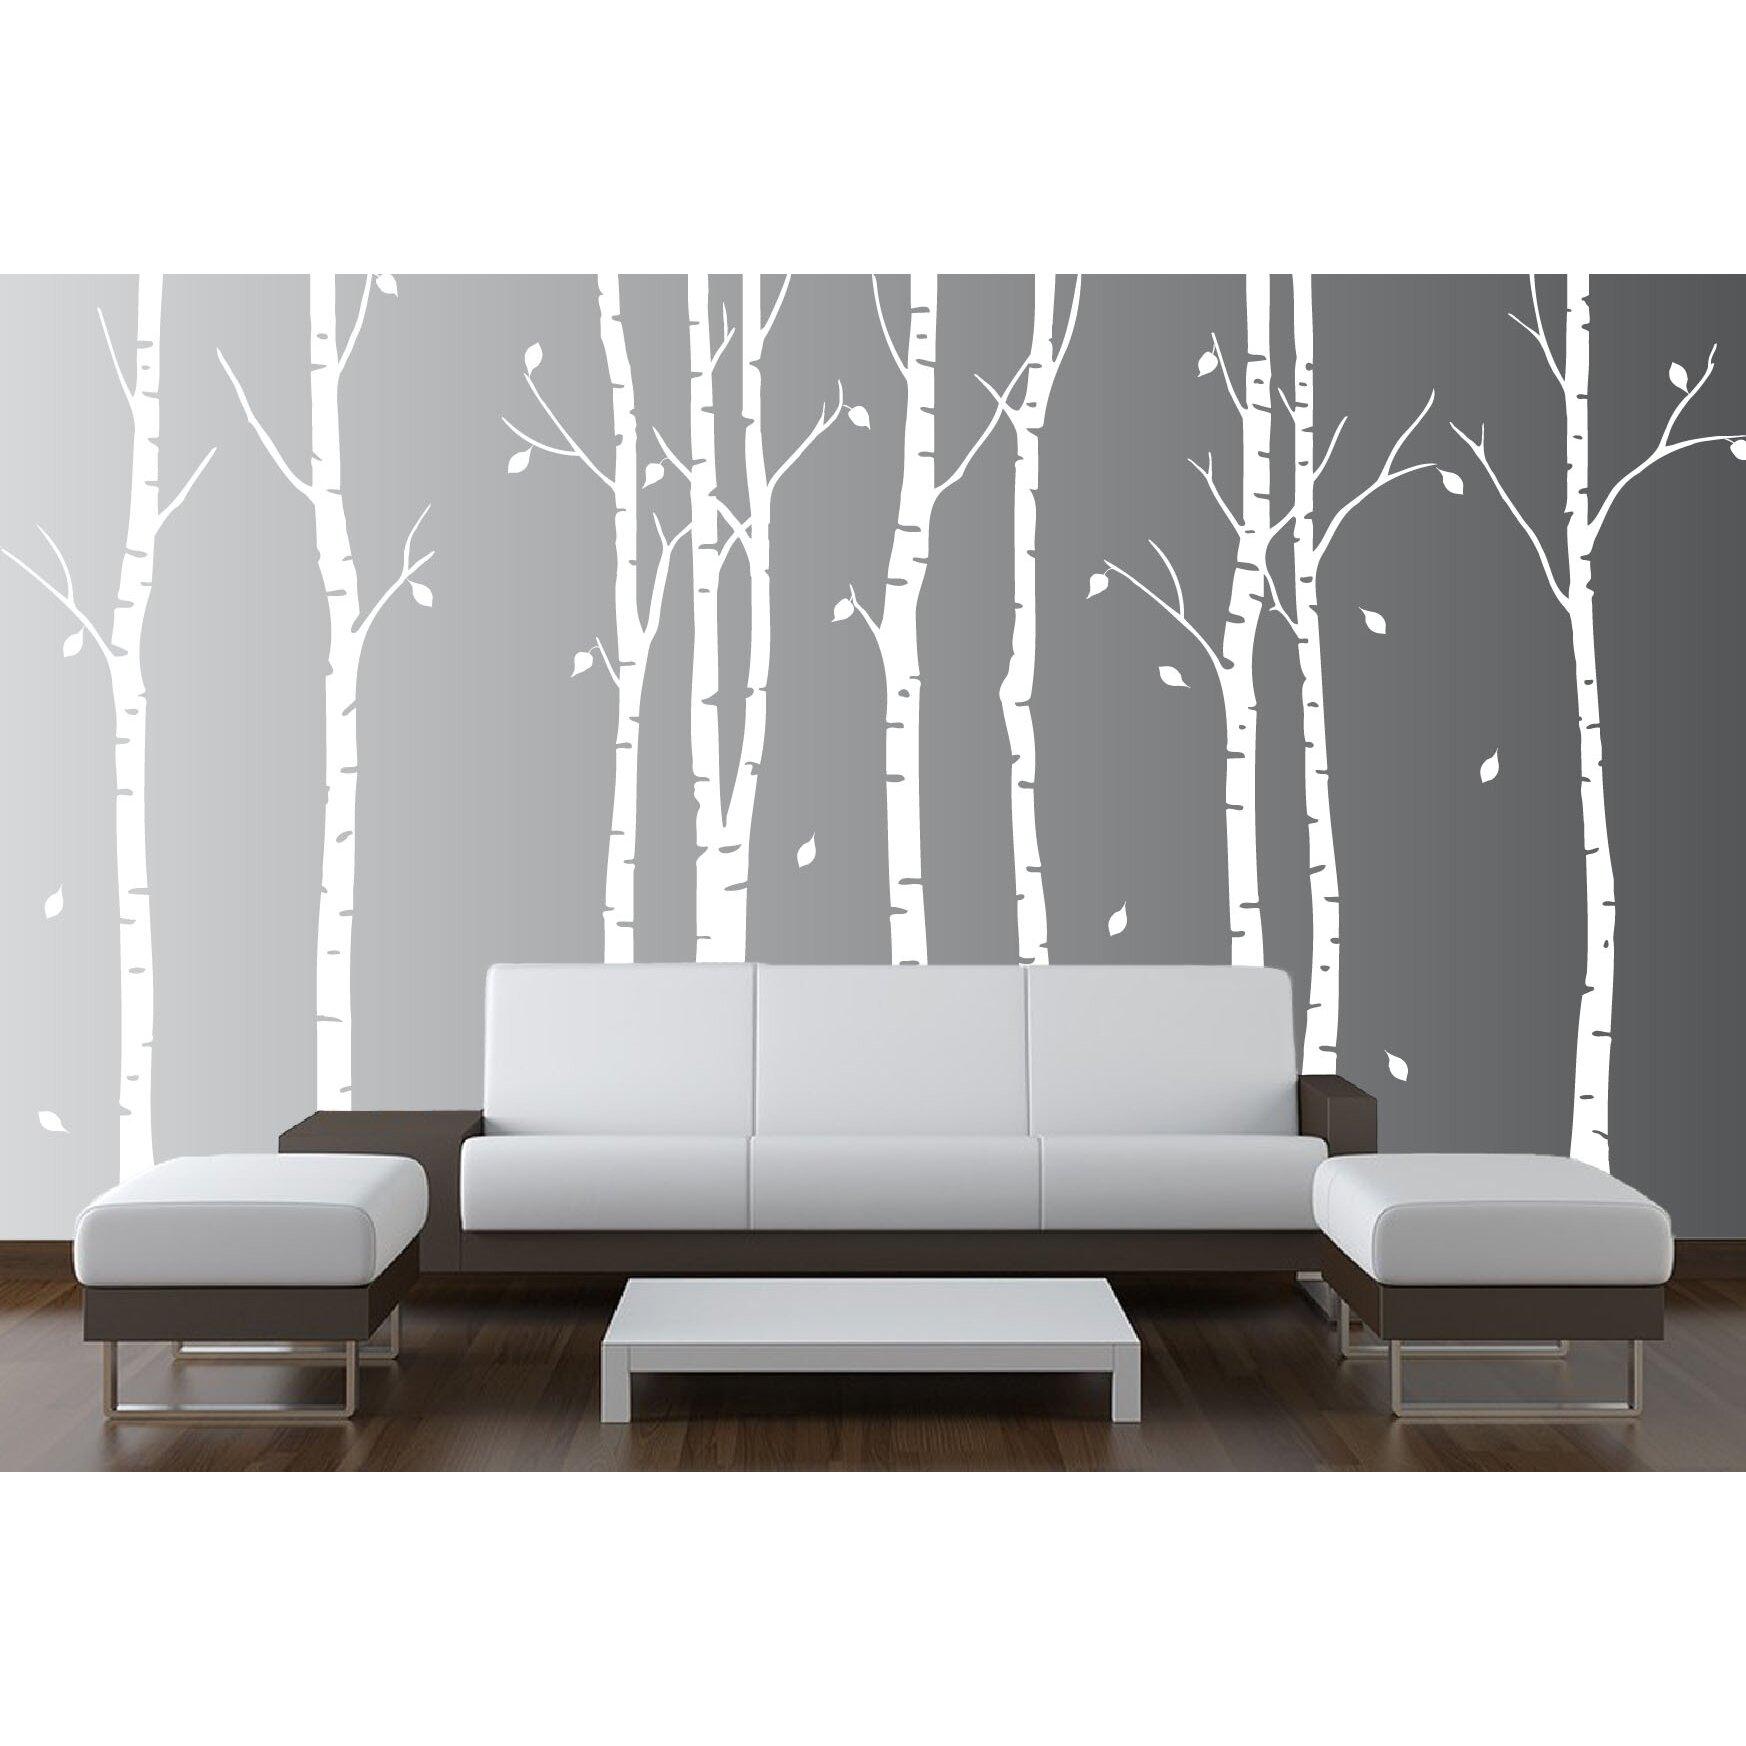 Innovative Stencils Birch Tree Nursery Forest Vinyl